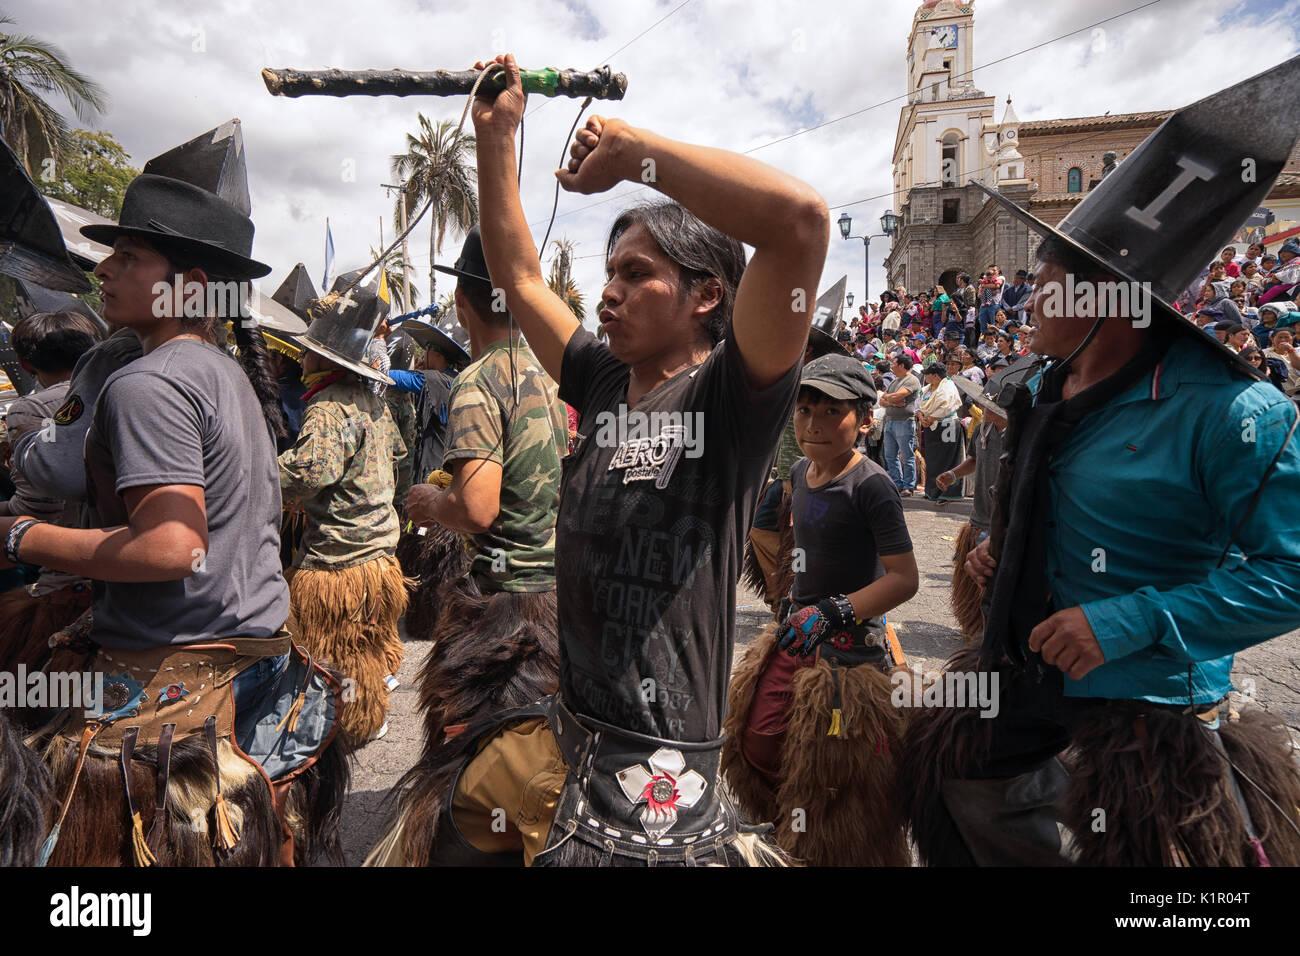 indigenous quechua men at Inti Raymi parade in Cotacachi Ecuador - Stock Image